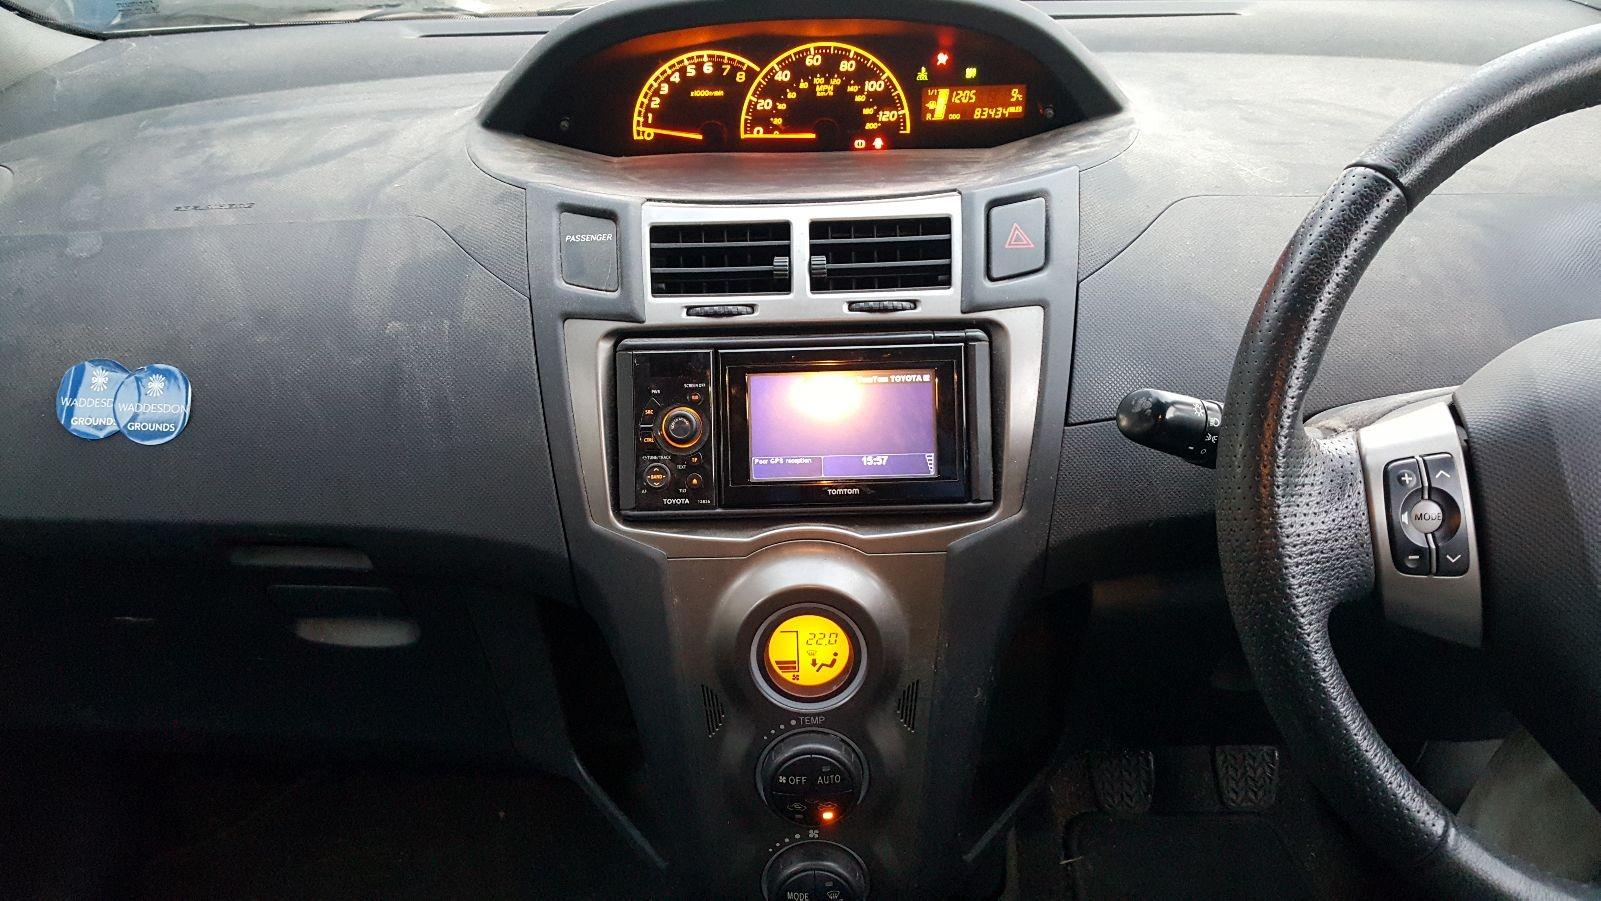 View Auto part Engine Toyota Yaris 2011